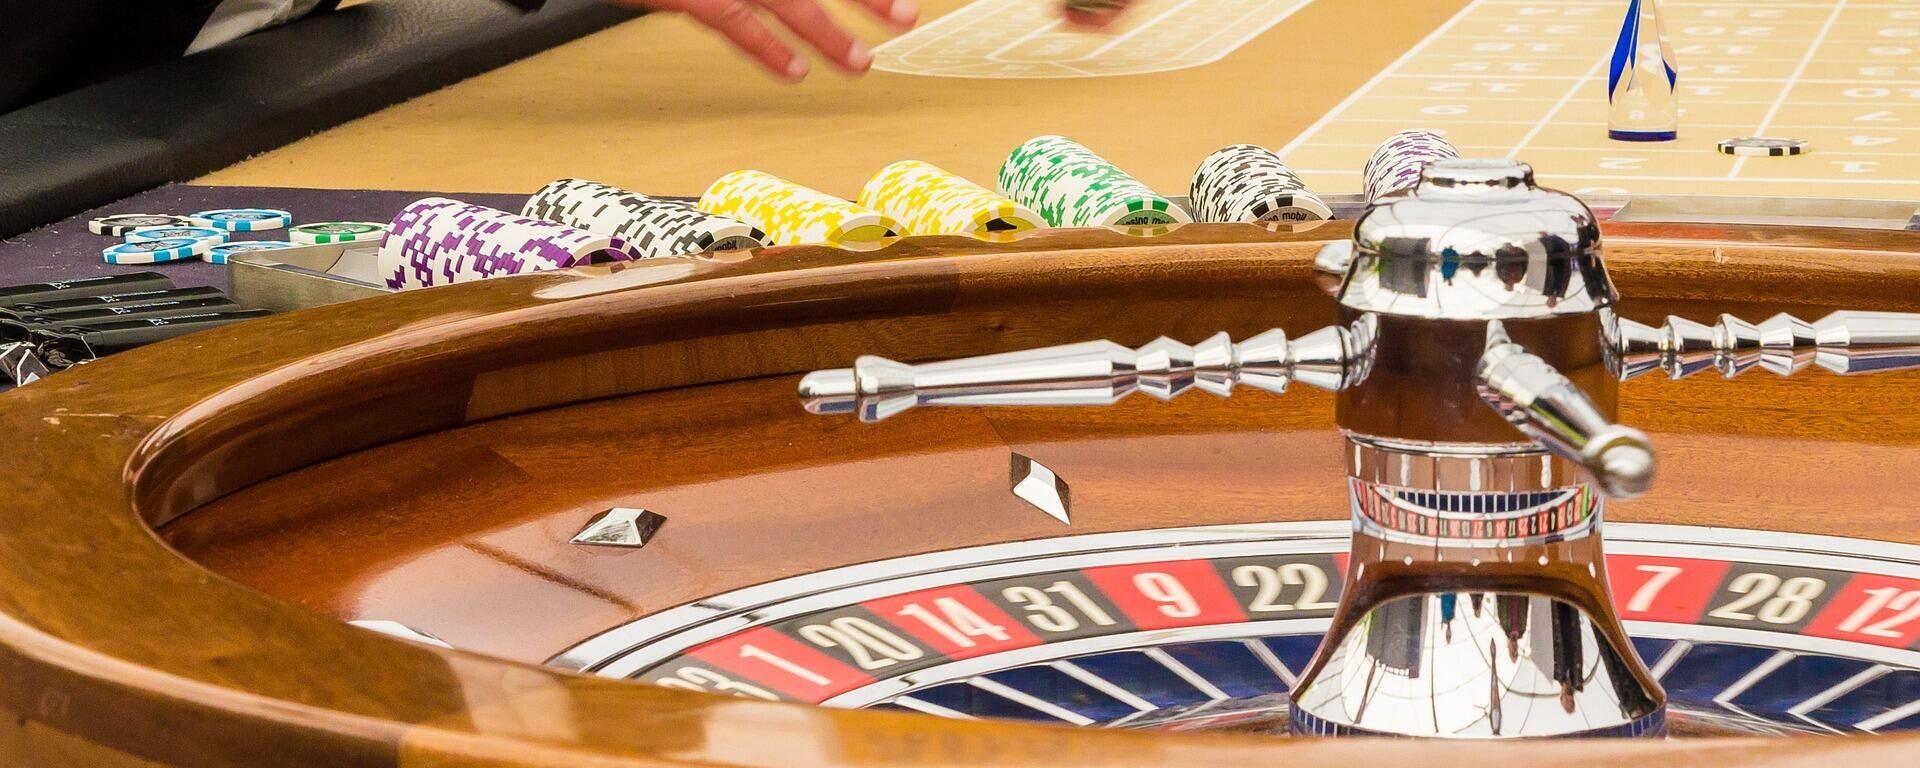 Glücksspiel, Symbolbild  - SNA, 1920, 23.01.2021